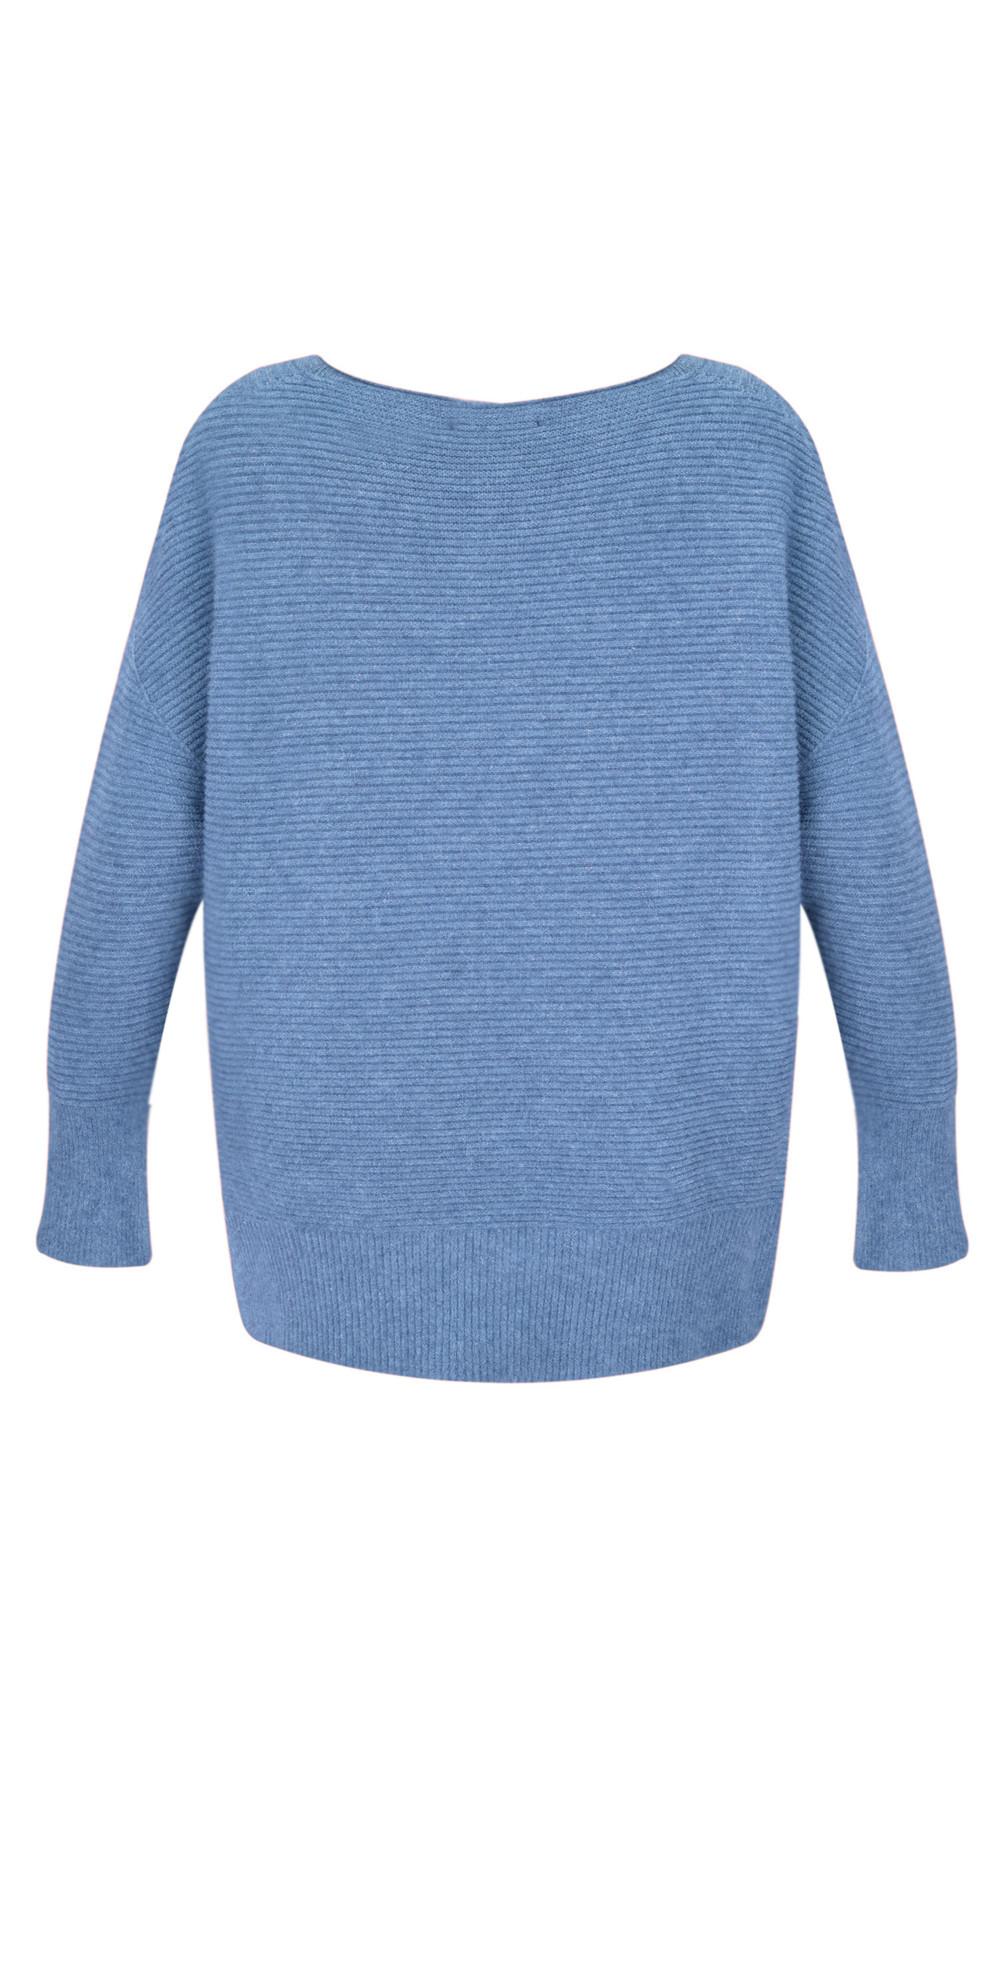 Frenchie Easyfit Rib Knit Jumper main image